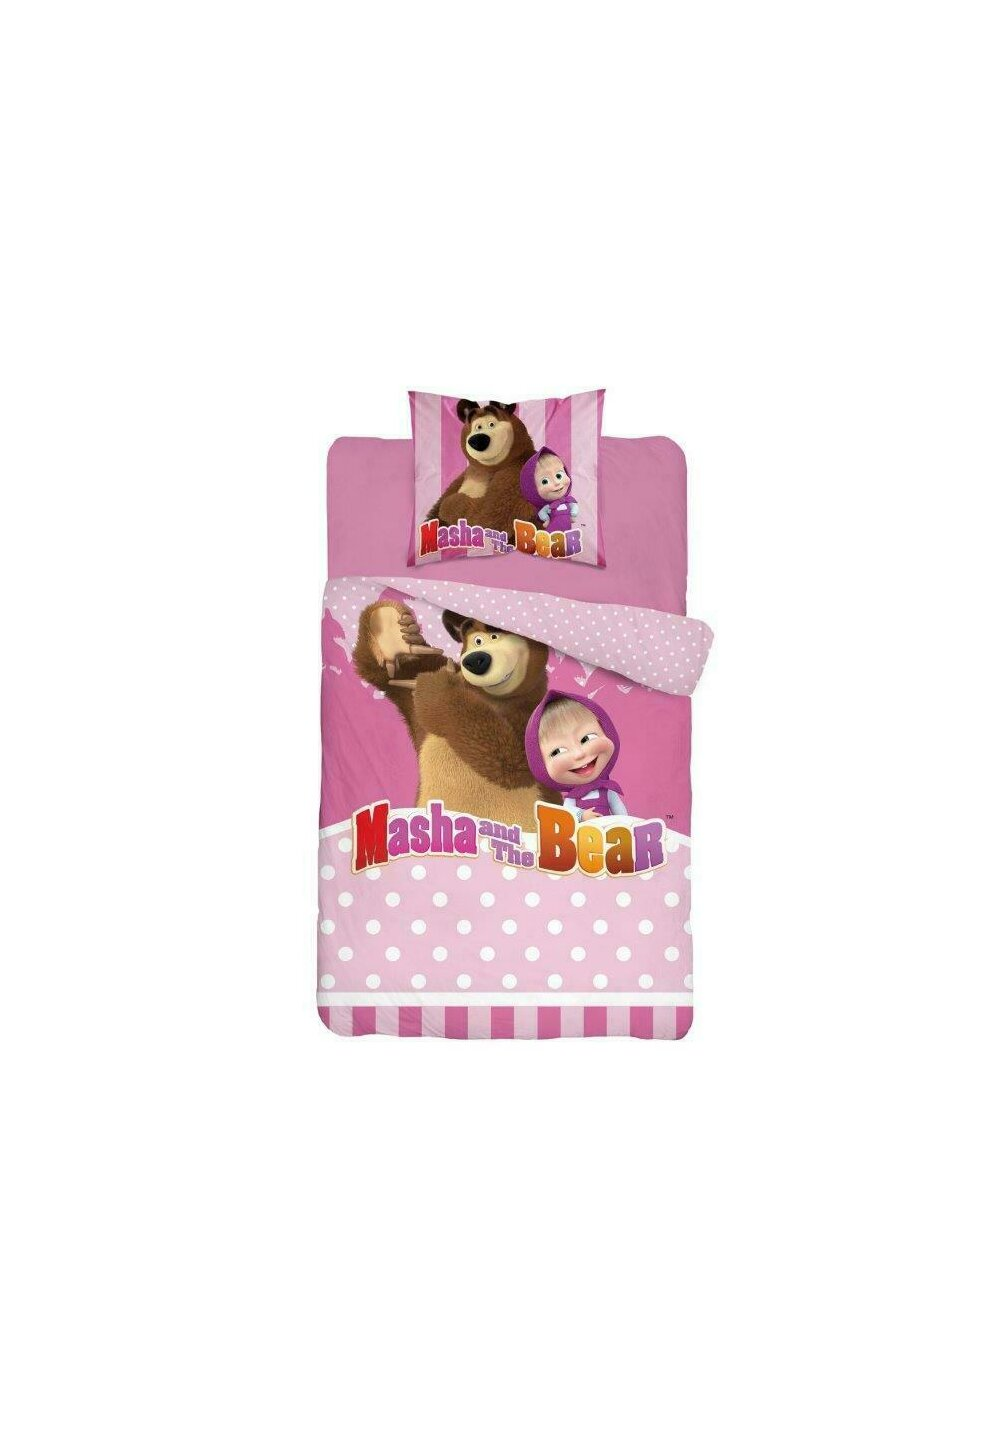 Lenjerie pat, Masha si Ursul, roz cu buline albe,140x200 cm imagine